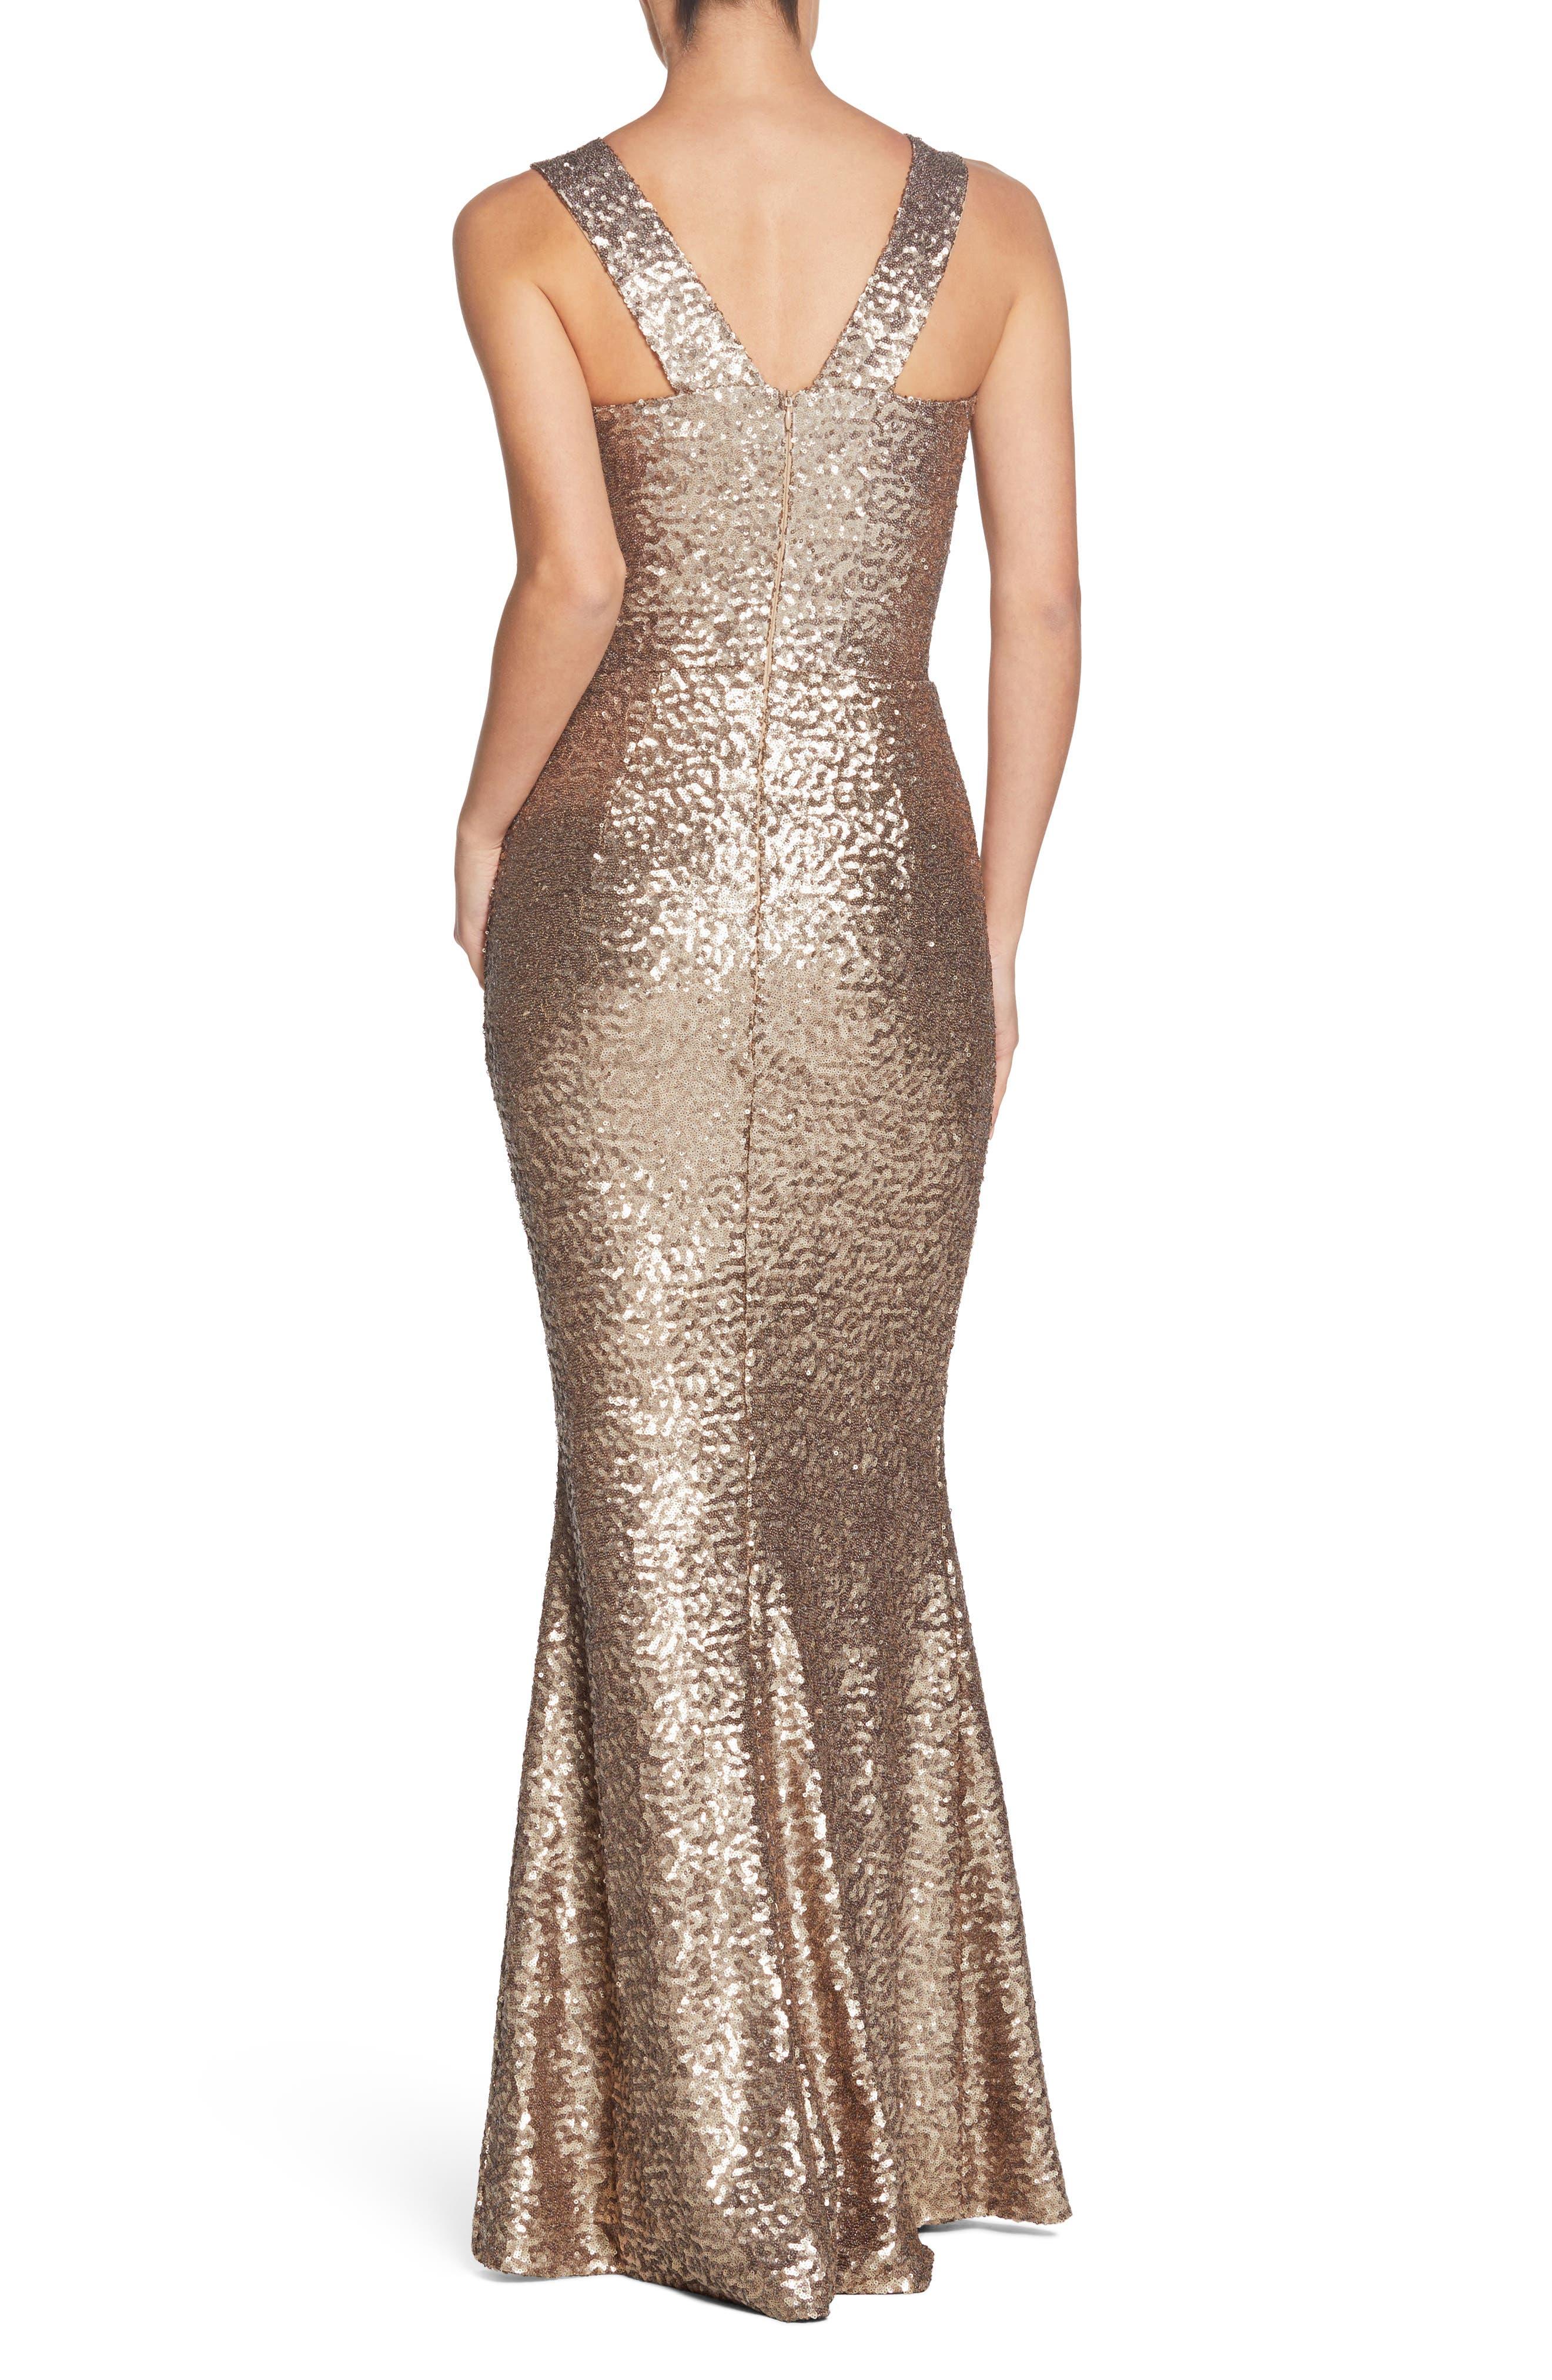 Raven Sequin Gown,                             Alternate thumbnail 2, color,                             Brass